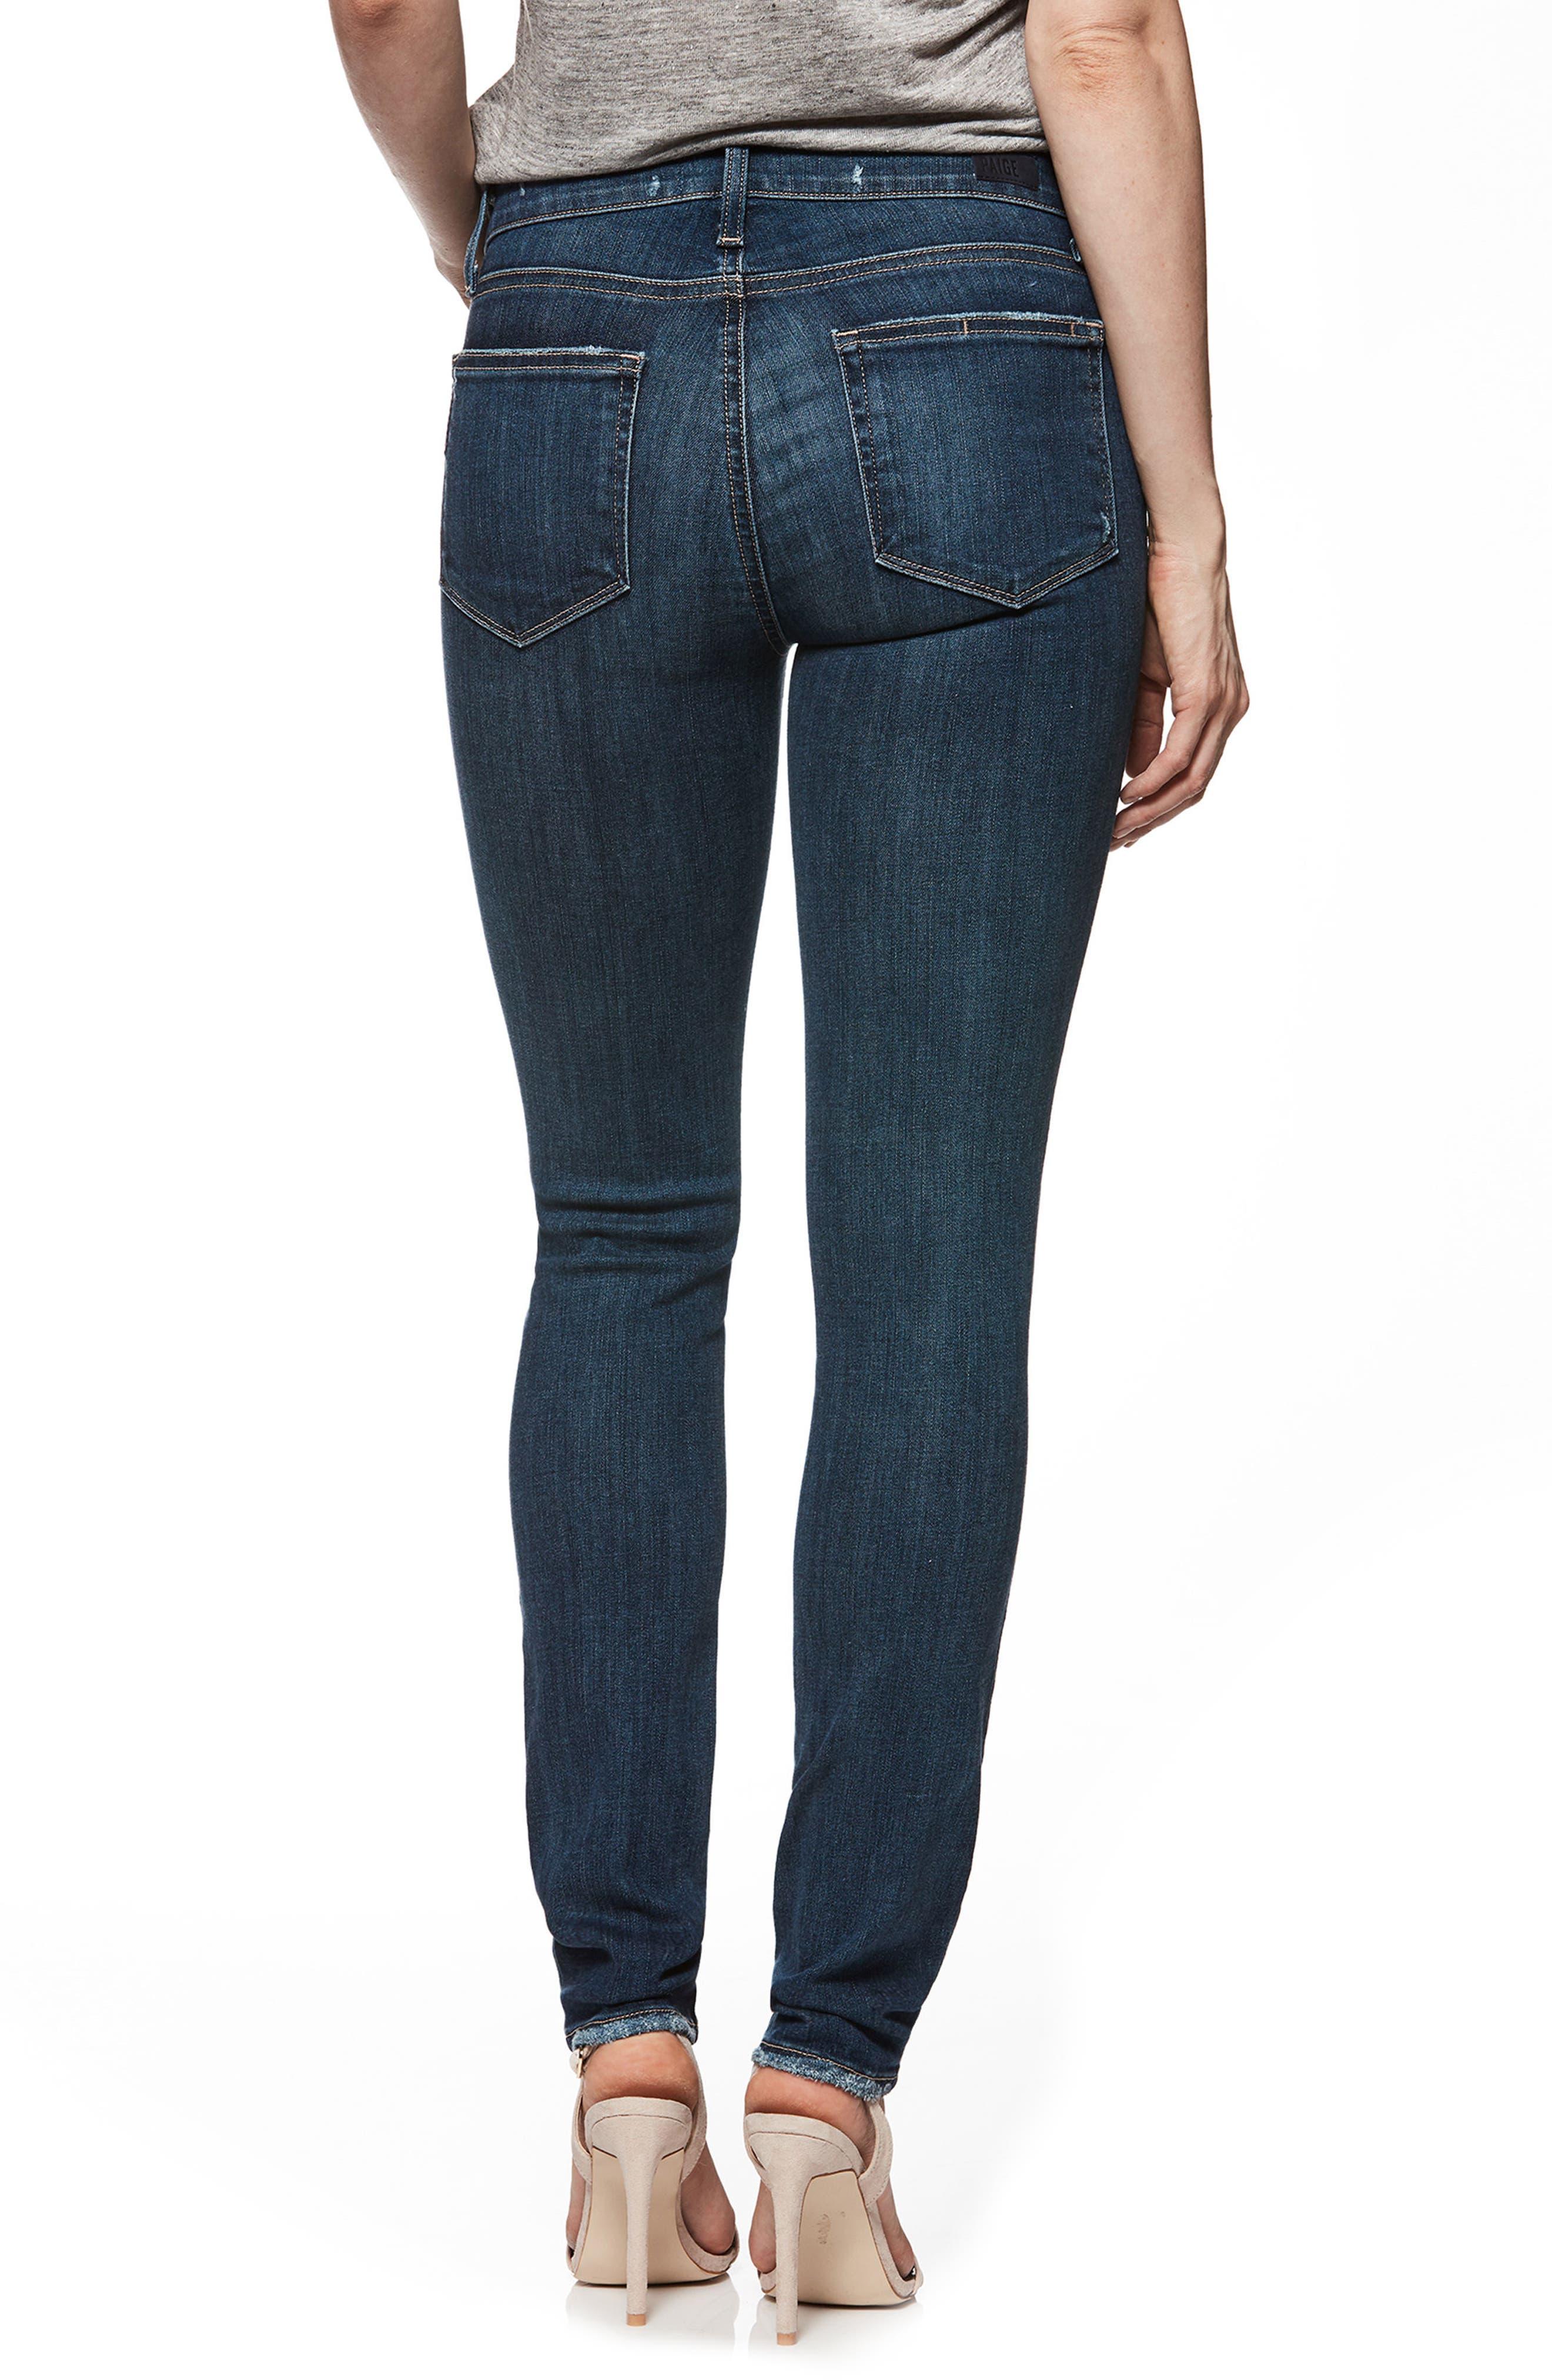 Transcend Vintage - Verdugo Ultra Skinny Jeans,                             Alternate thumbnail 3, color,                             Emilio